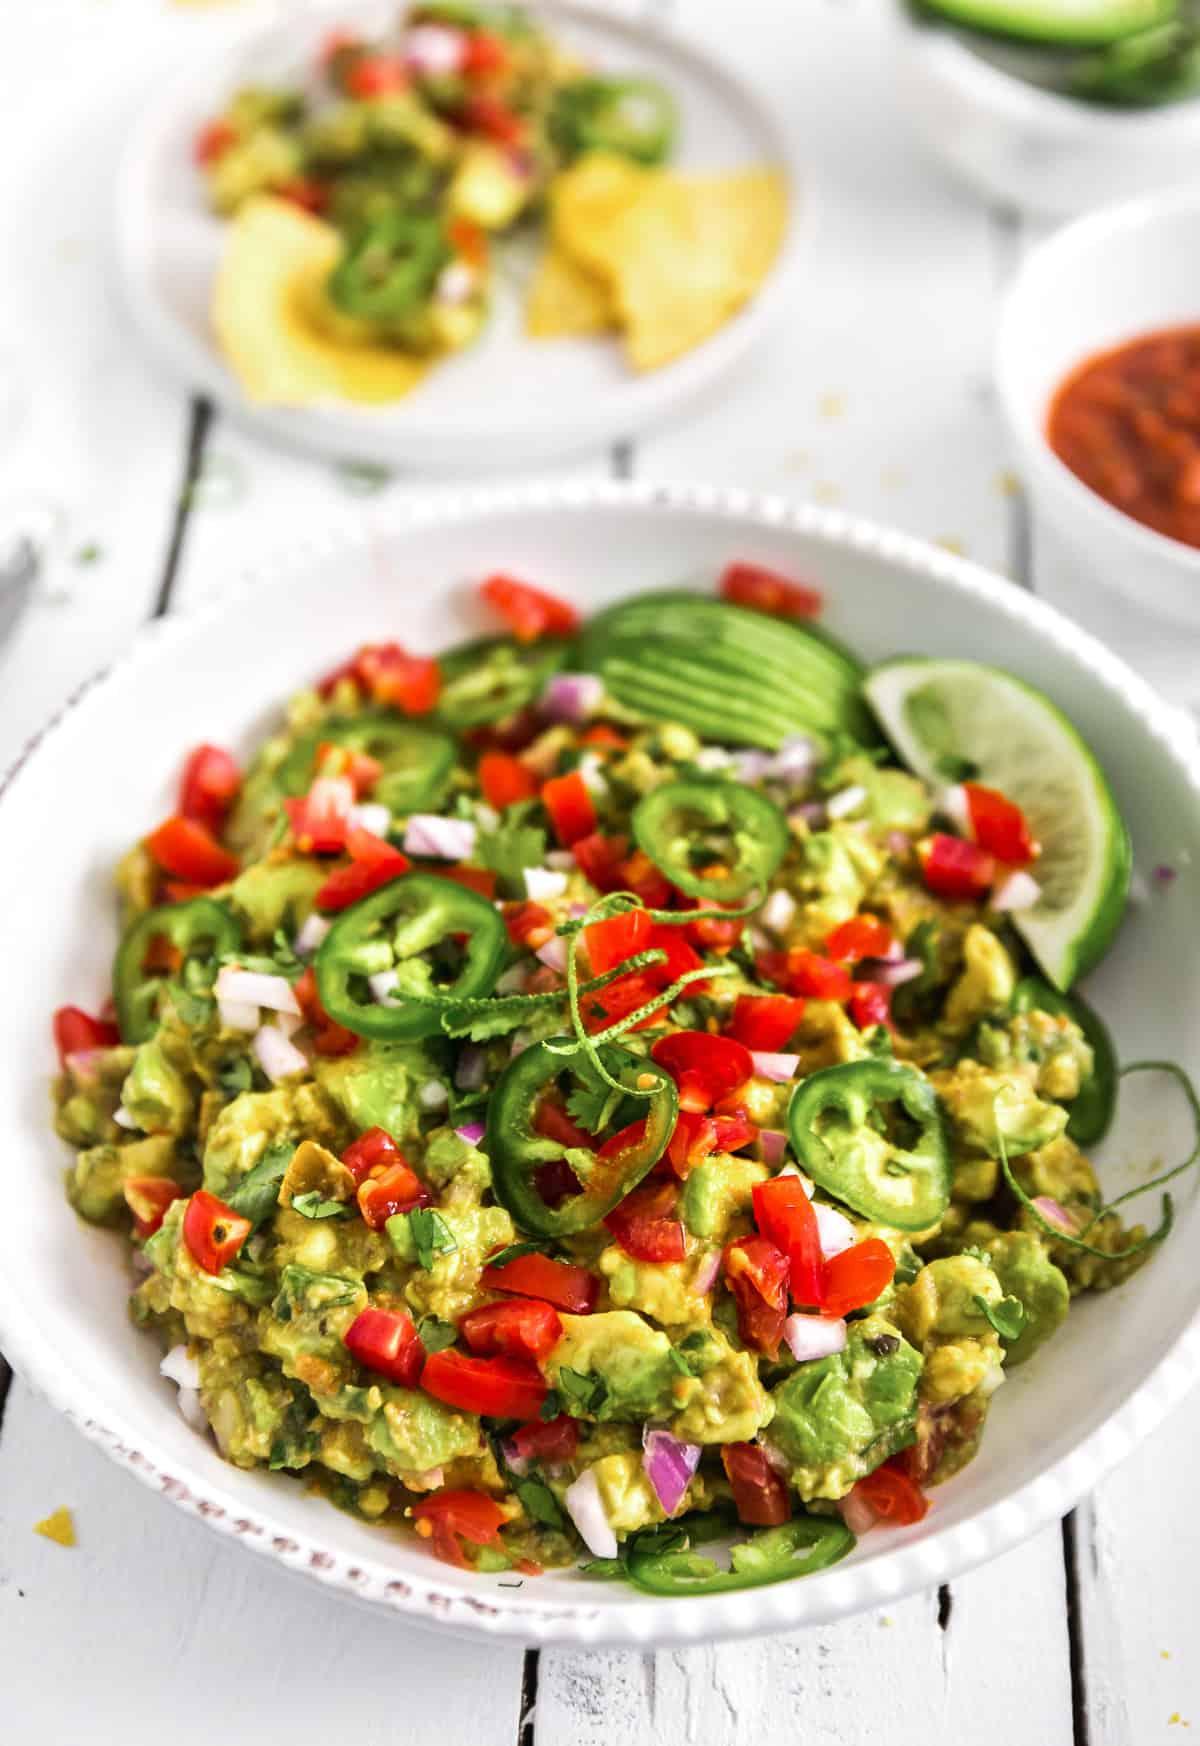 Guacamole, plant based, vegan, vegetarian, whole food plant based, gluten free, recipe, wfpb, healthy, healthy vegan, oil free, no refined sugar, no oil, refined sugar free, dairy free, appetizer, snack, avocados, dip, salsa